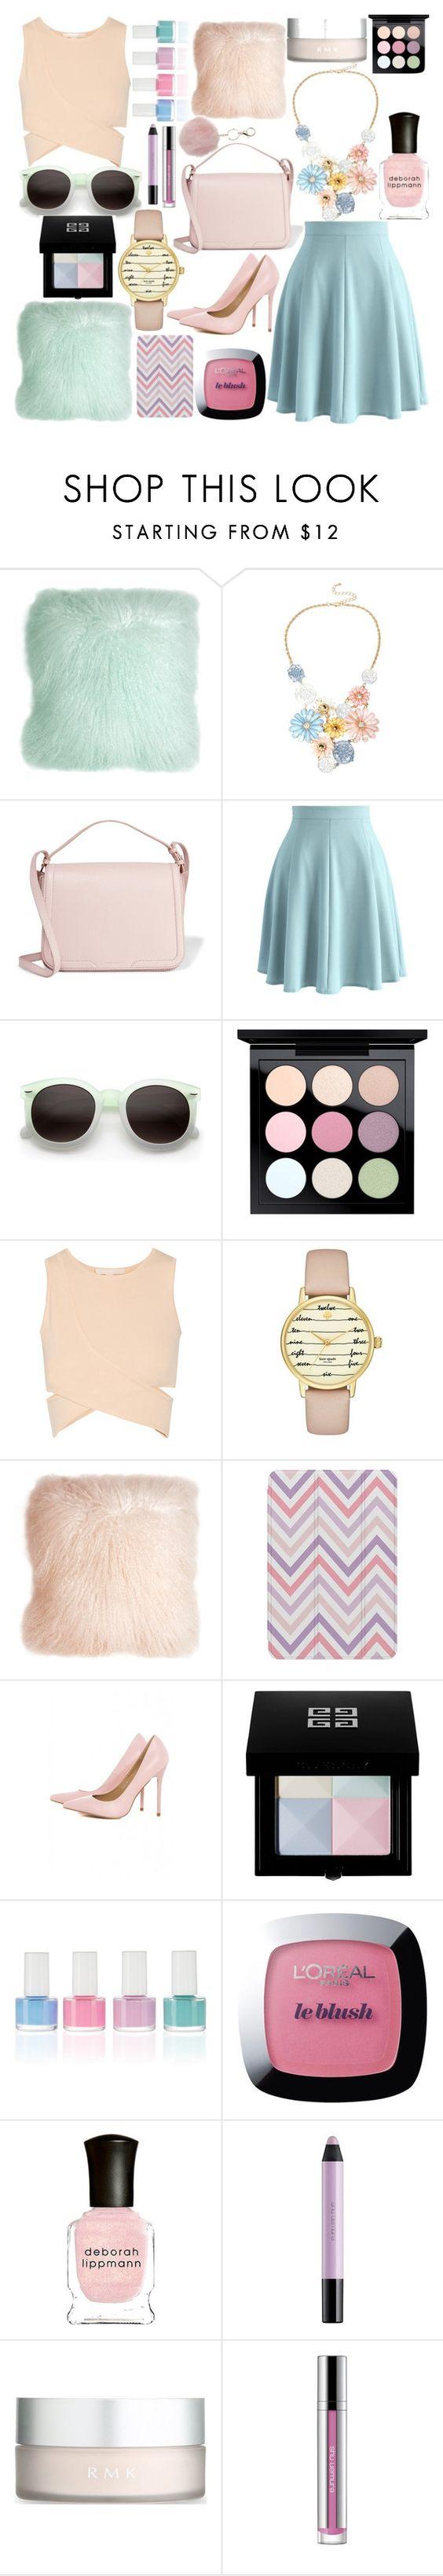 """pastel"" by chantal-07 ❤ liked on Polyvore featuring Pillow Decor, Mixit, Dolce&Gabbana, Chicwish, ZeroUV, MAC Cosmetics, Jonathan Simkhai, Kate Spade, Agent 18 and AX Paris"